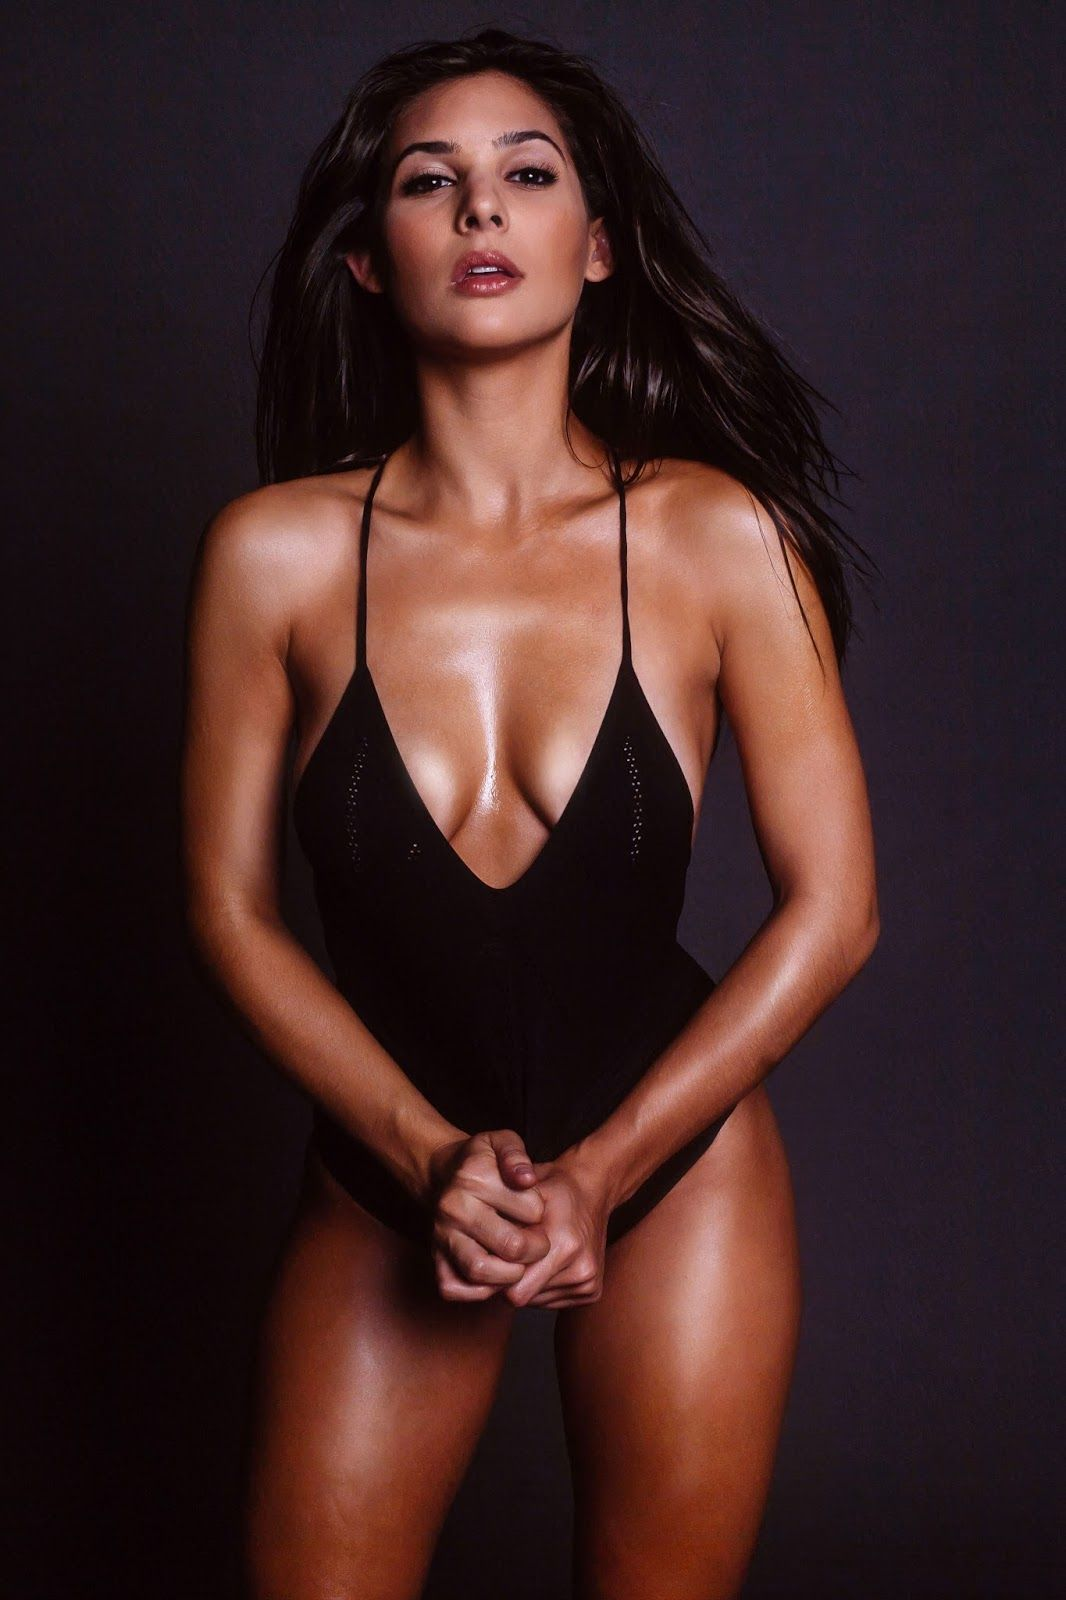 Bikini Camila Banus nude photos 2019